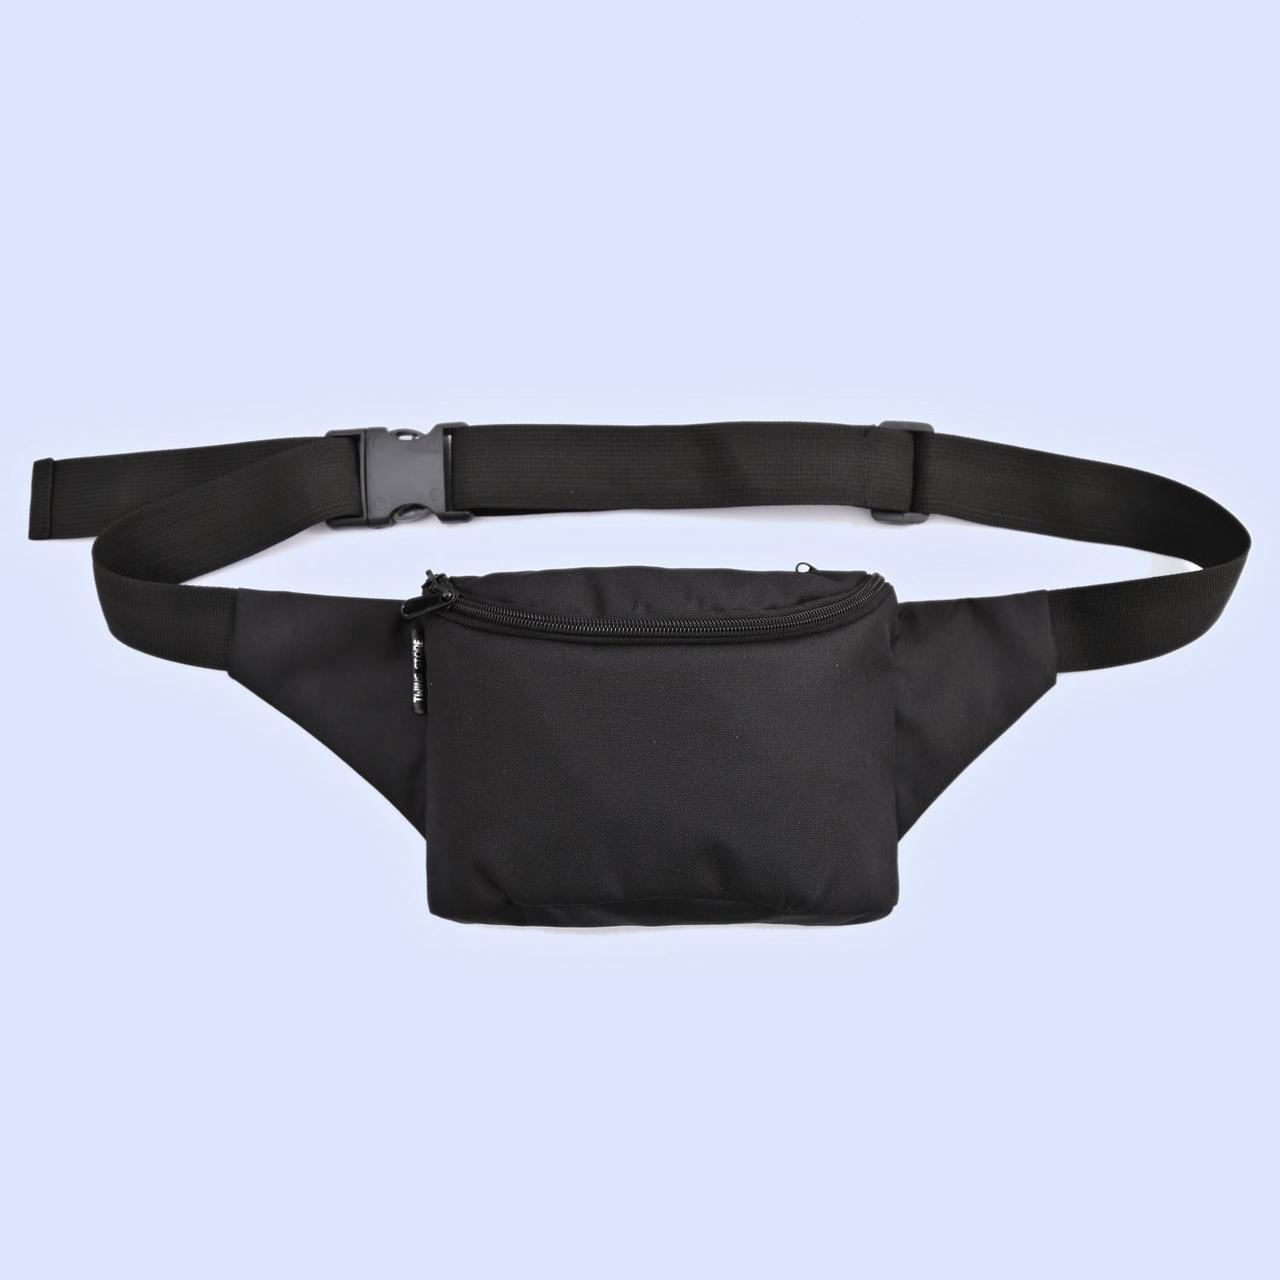 Поясная сумка Twins для планшета iPad mini черная